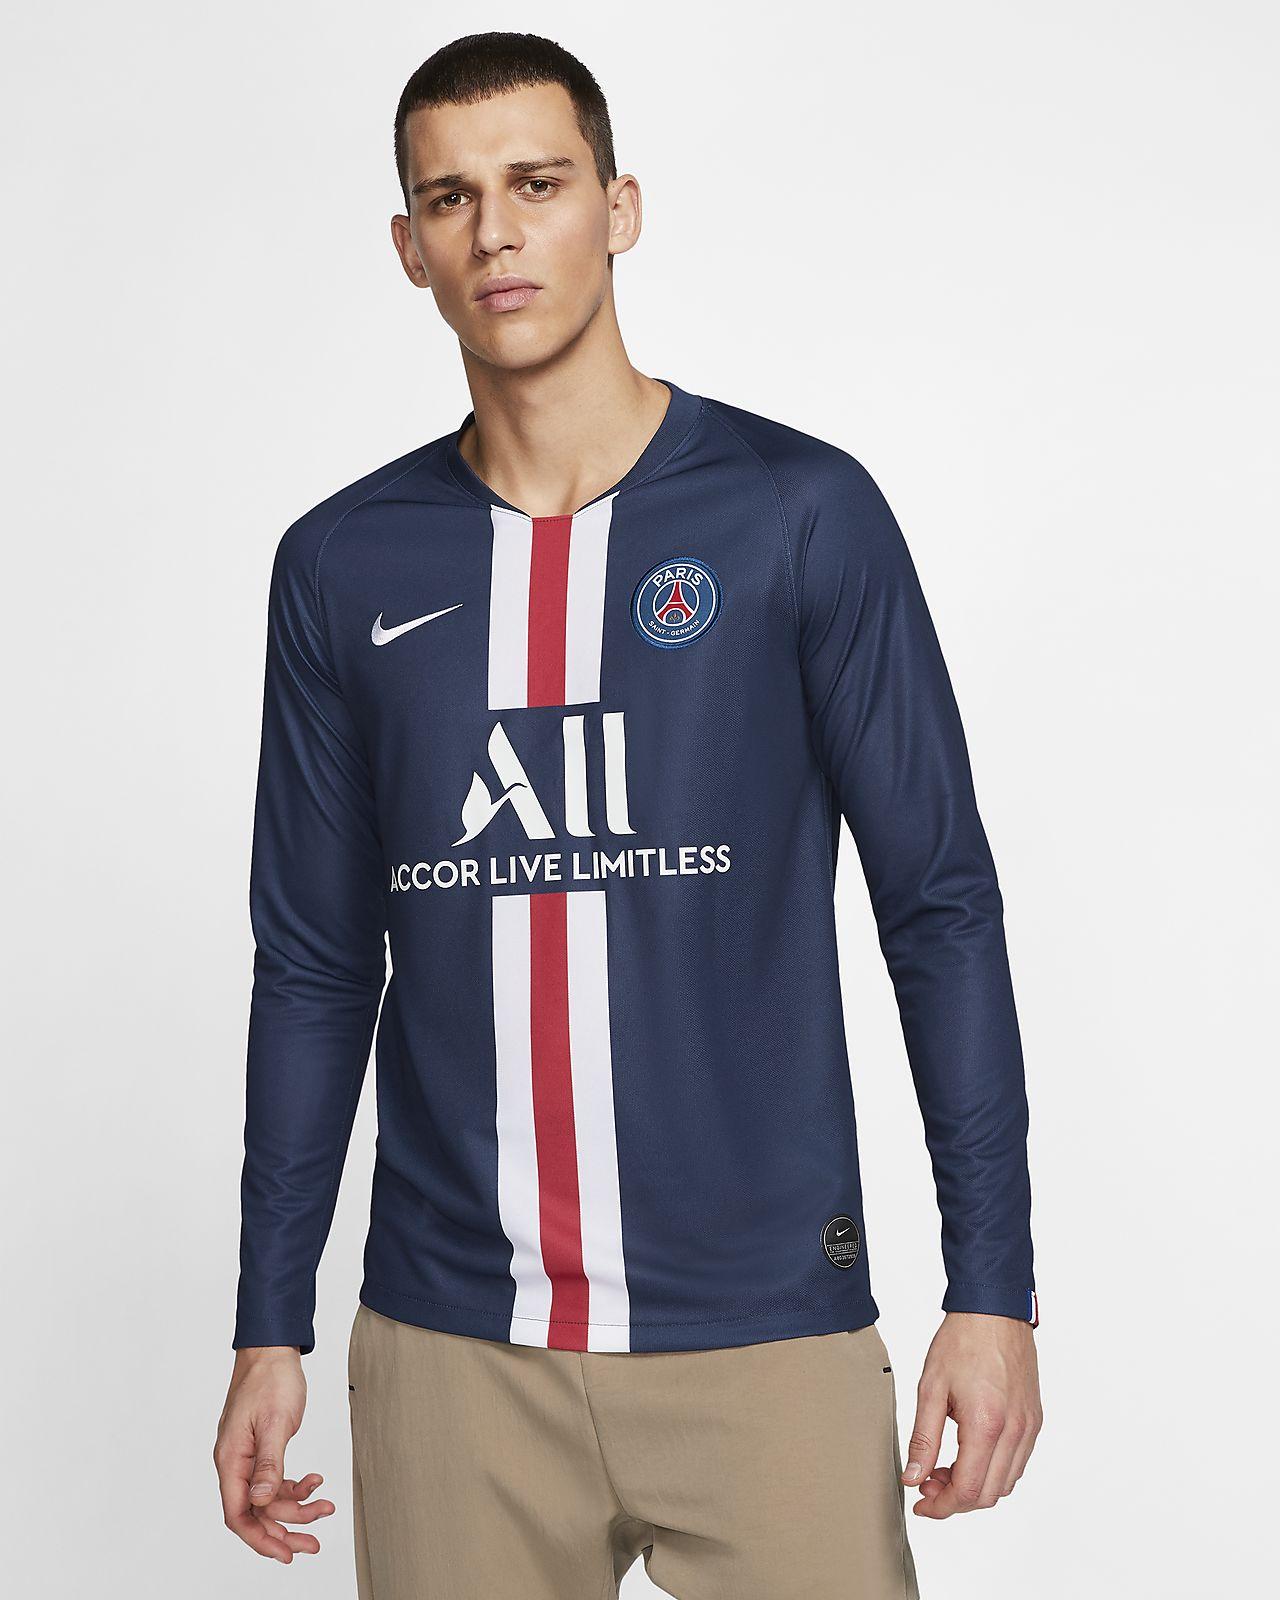 ab1b6c1ca ... Męska koszulka piłkarska z długim rękawem Paris Saint-Germain 2019/20  Stadium Home